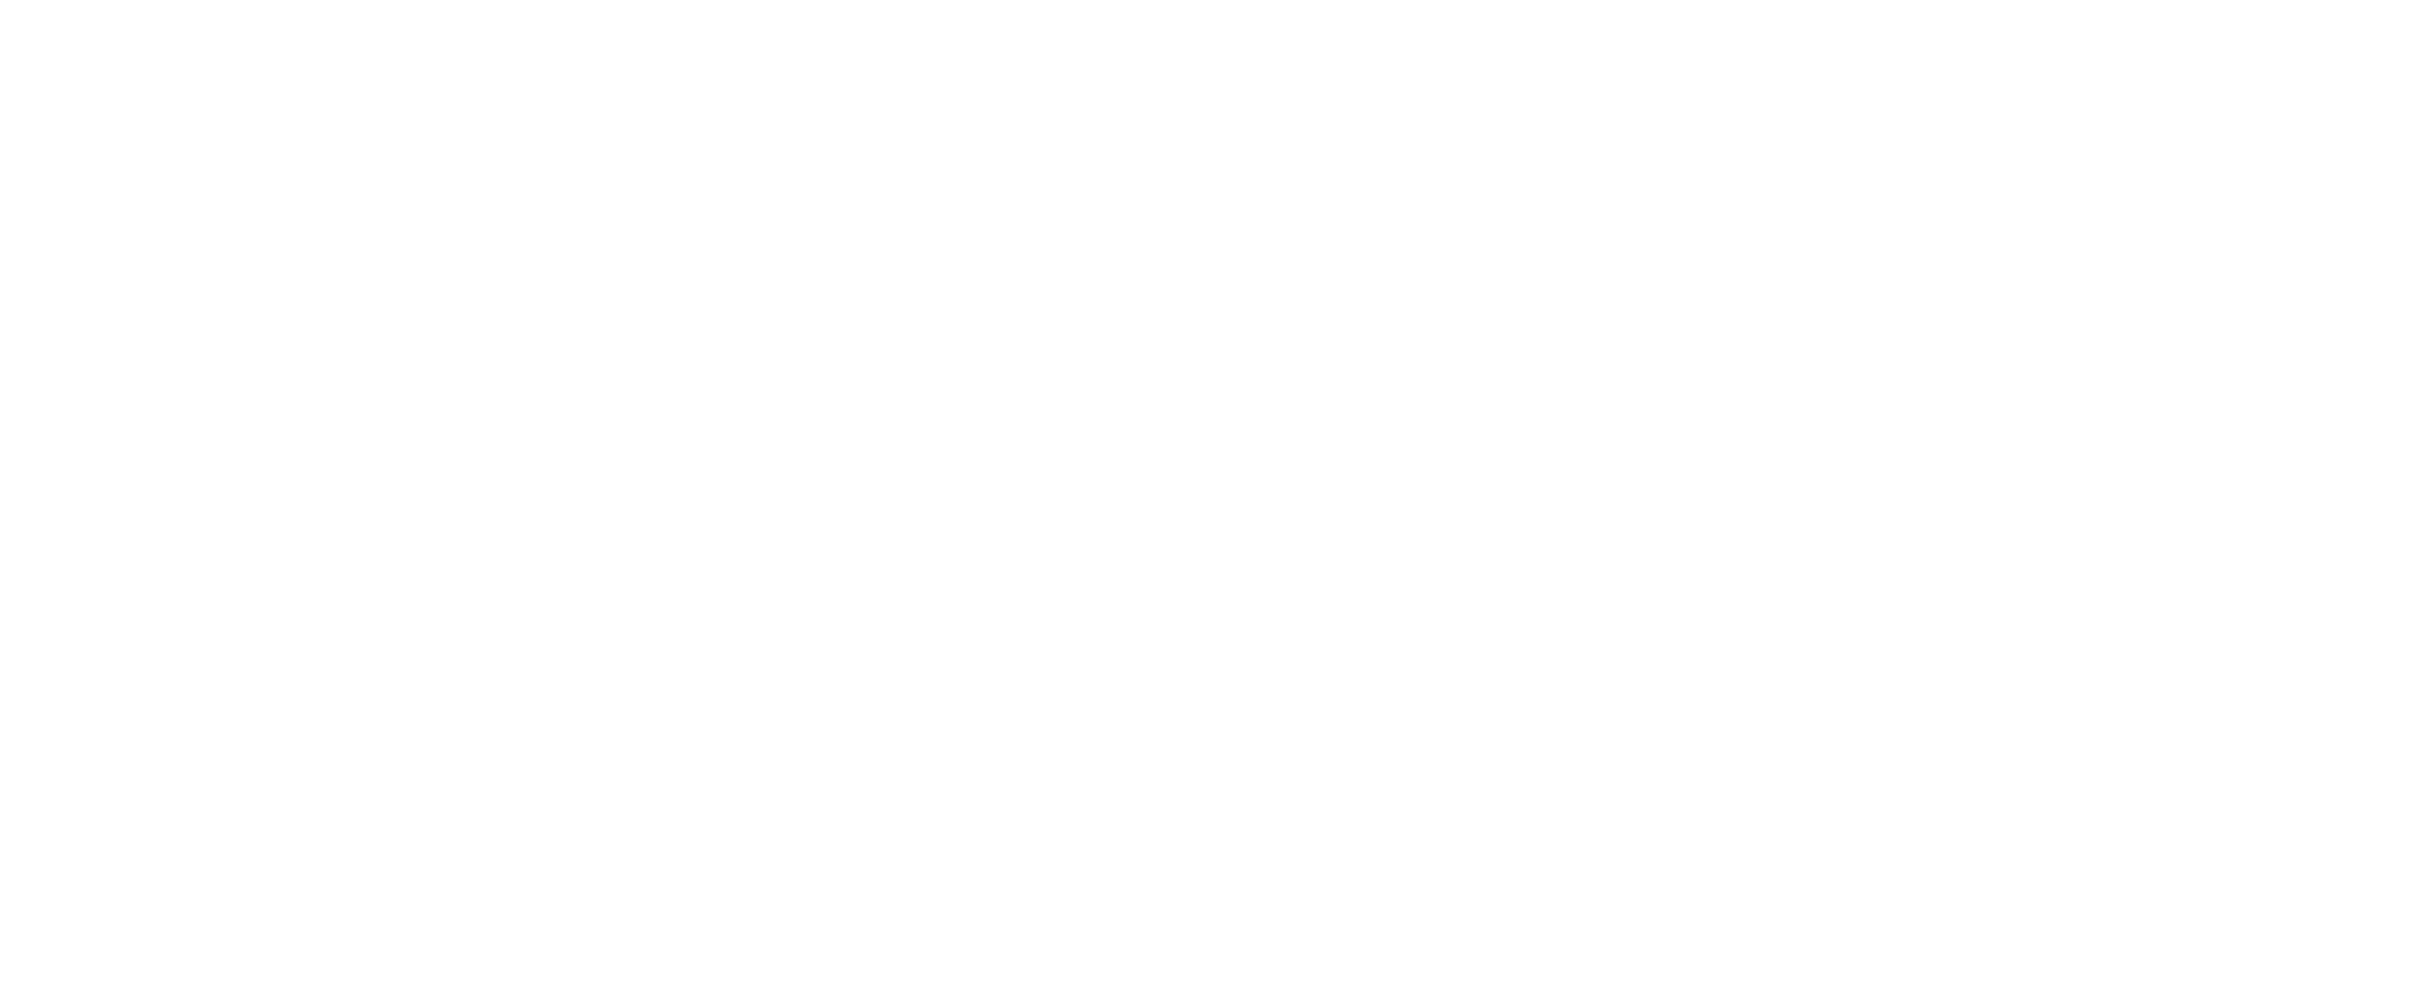 1771 Group